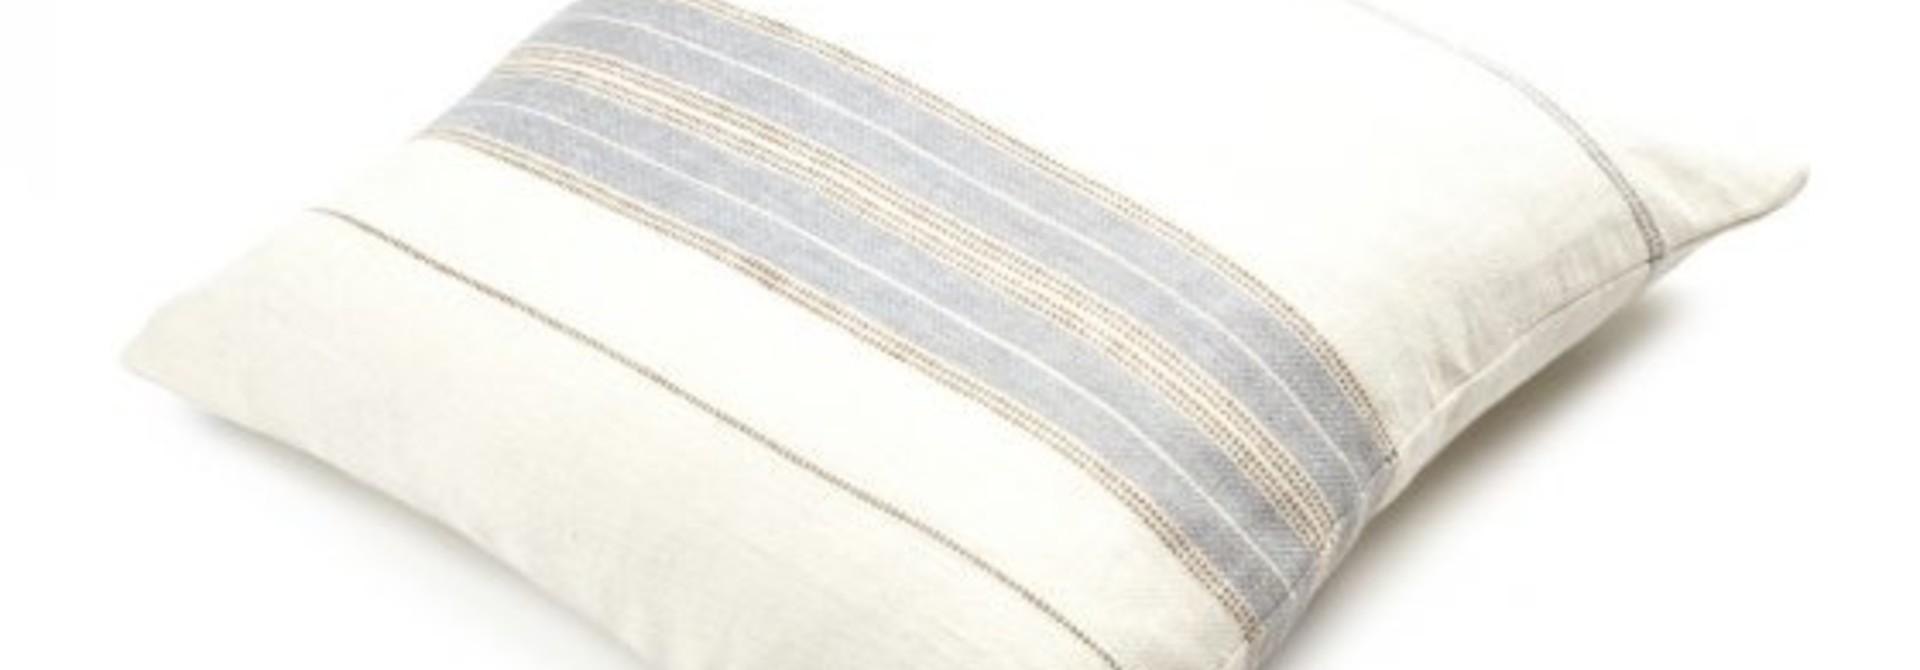 Cushion Cover- Propriano  - Lge